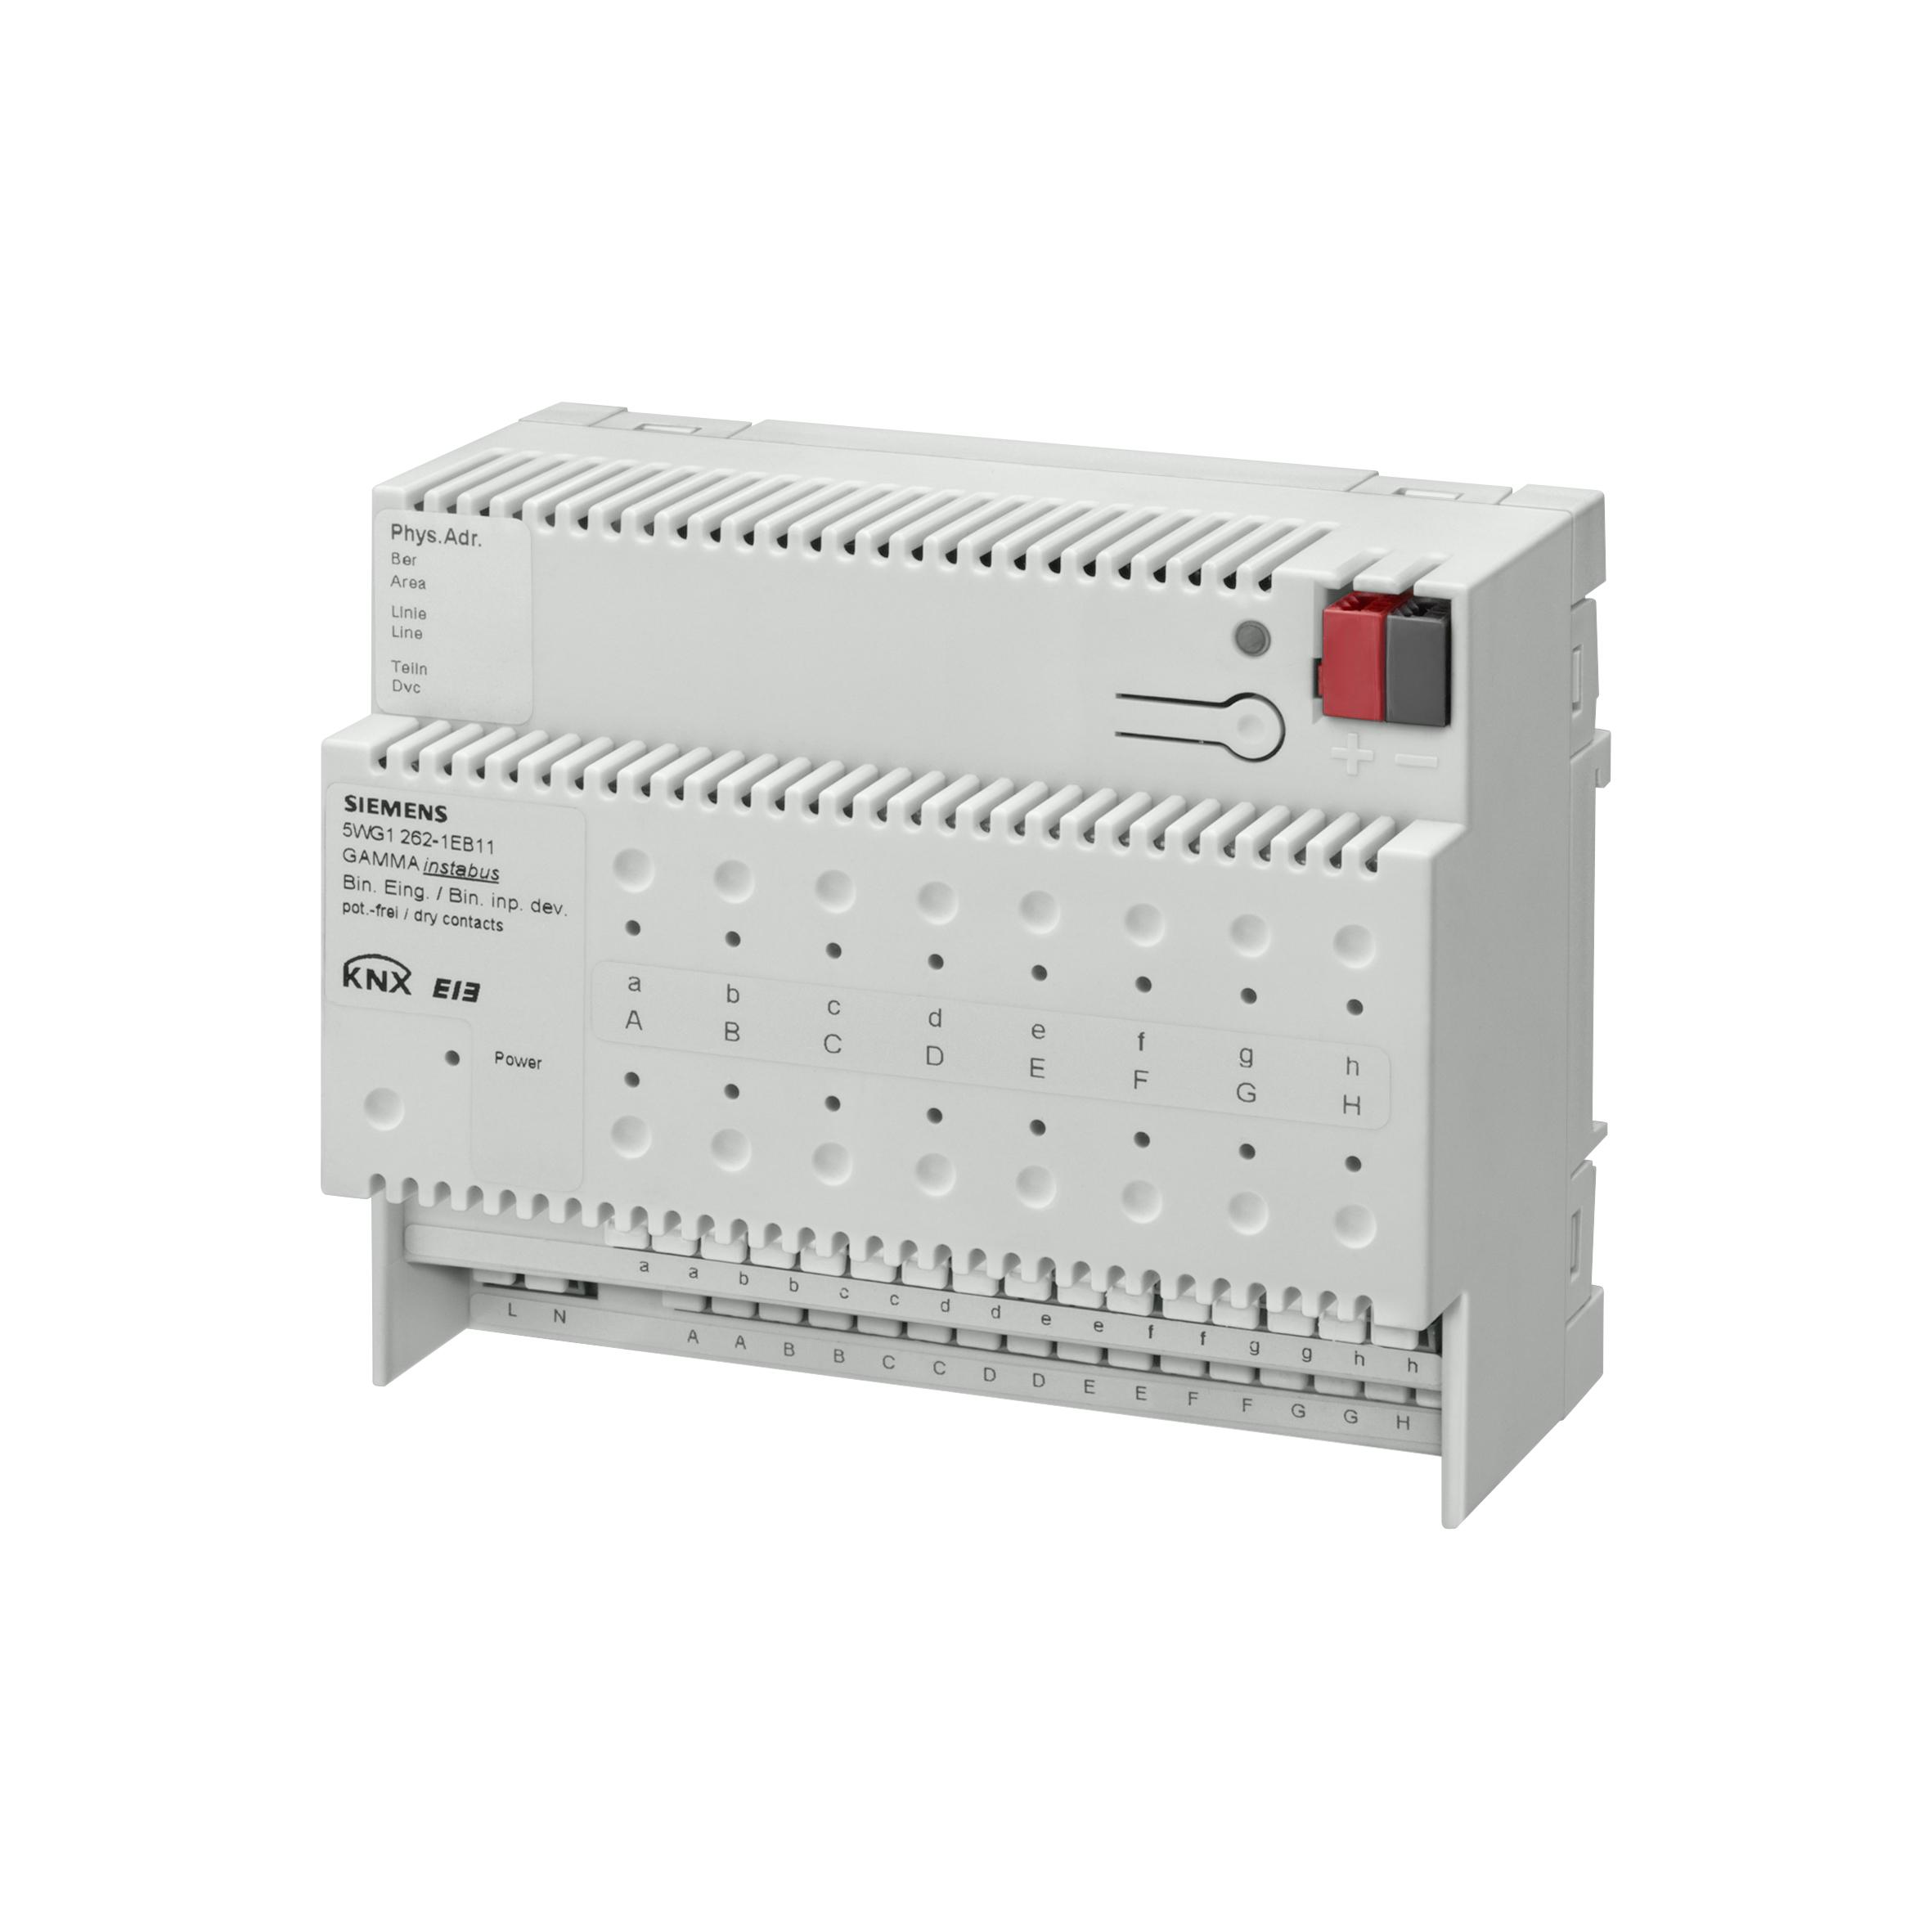 1 Stk Binäreingabegerät, 16 Eingänge für potentialfreie Kontakte KX2621EB11